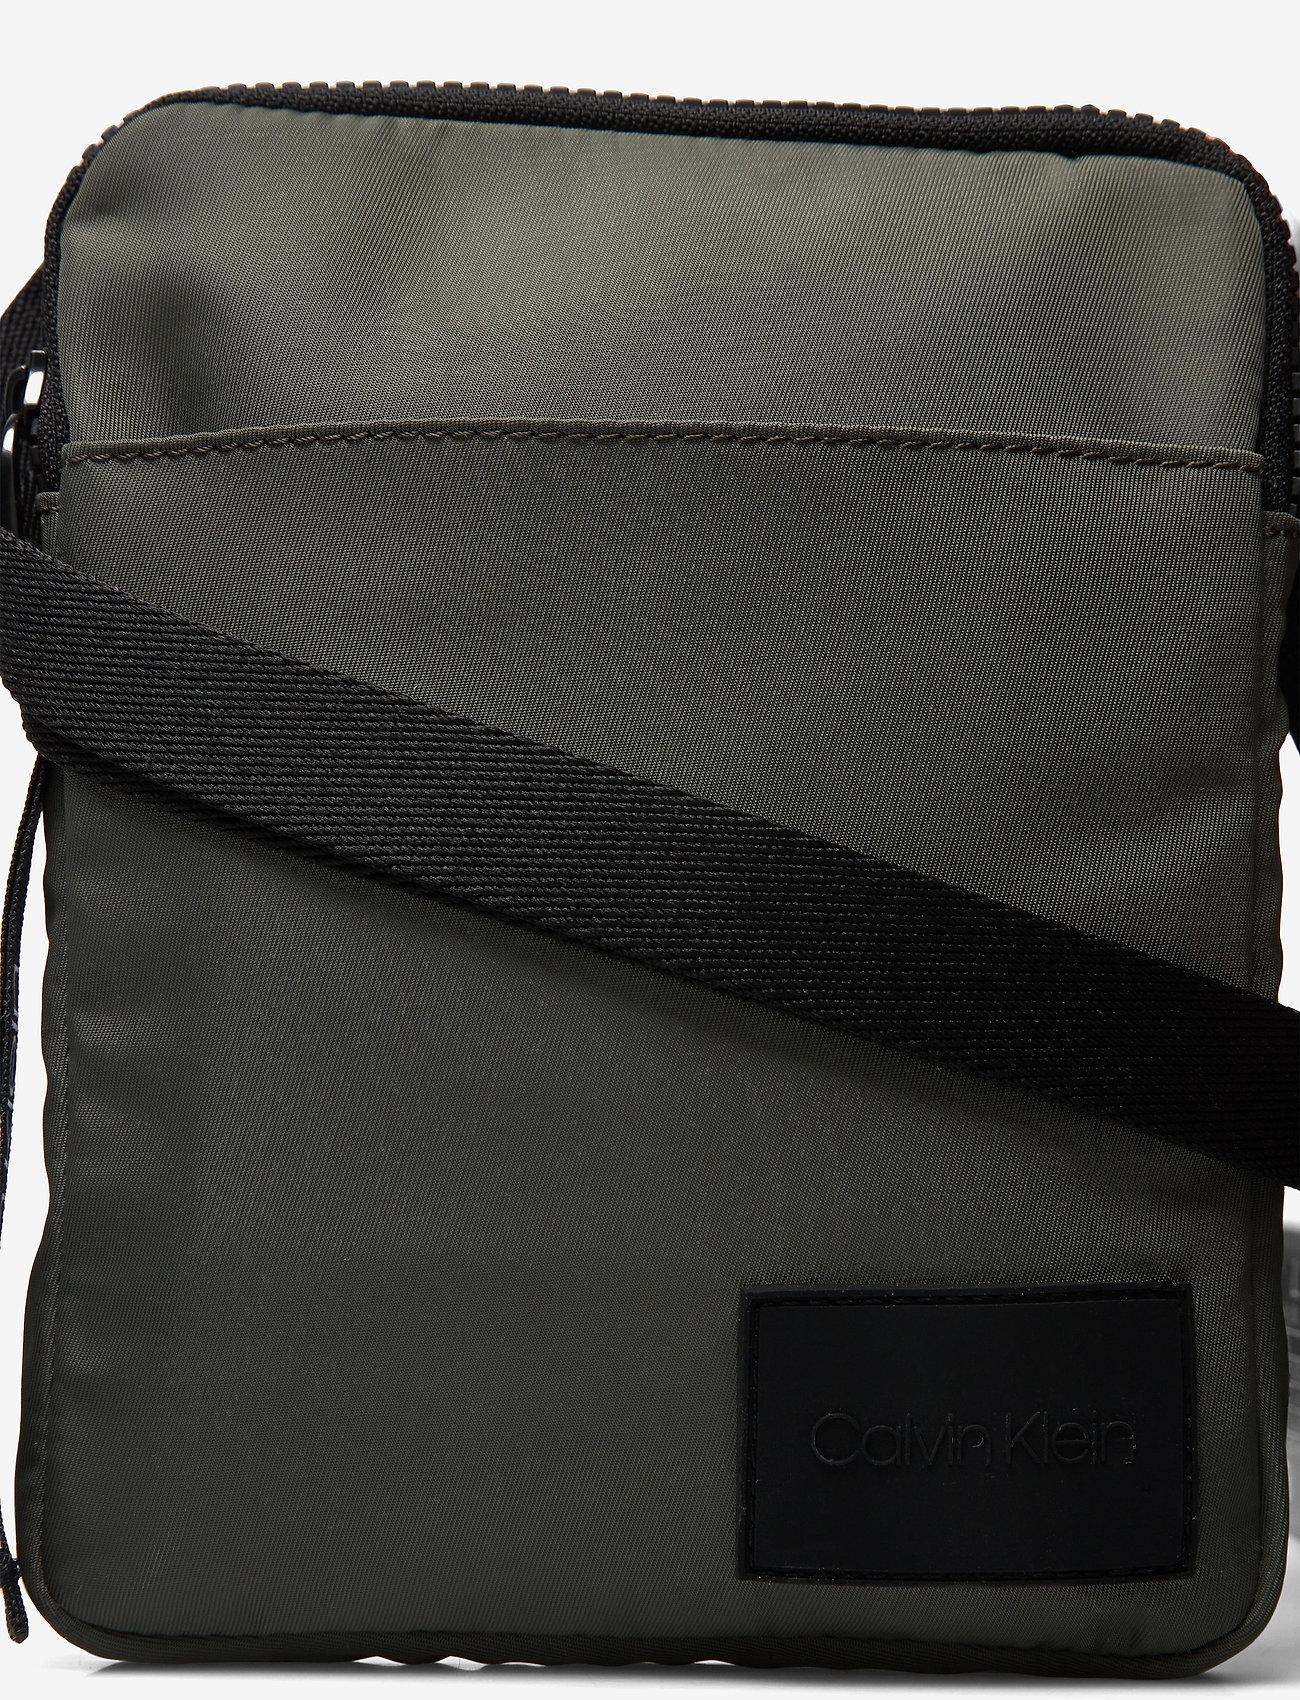 Calvin Klein - FLAT PACK S - shoulder bags - dark olive - 3